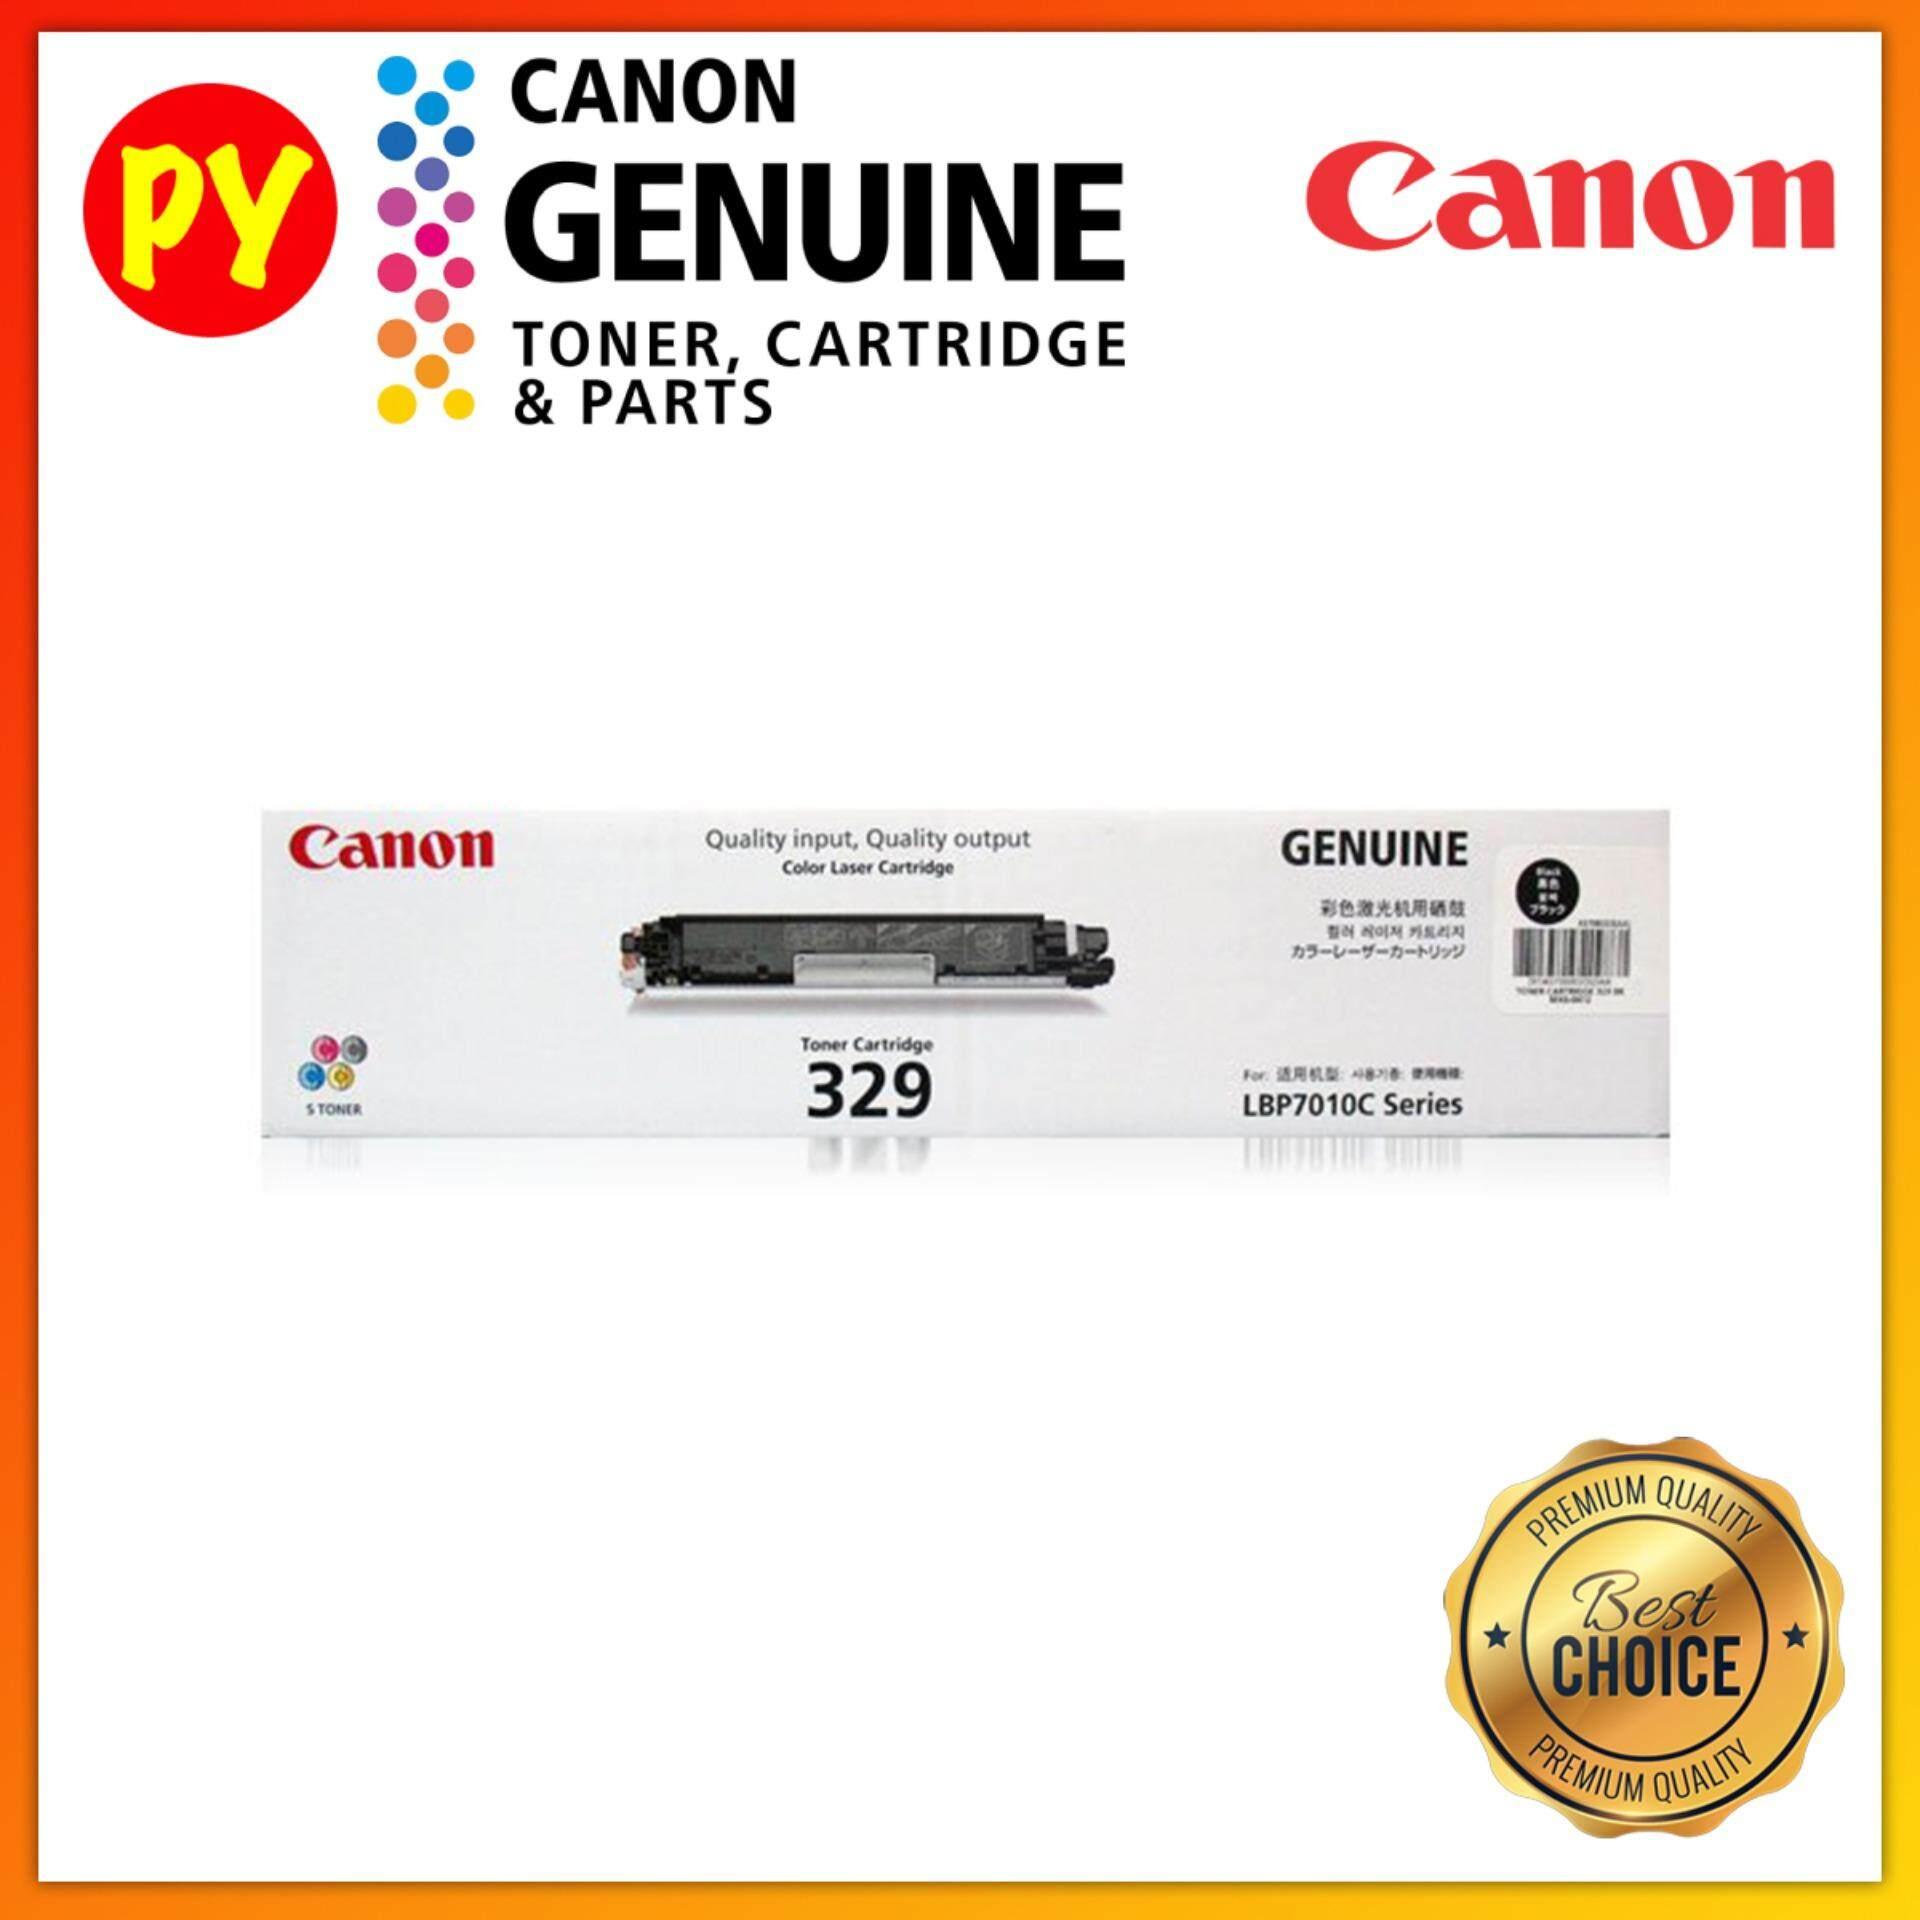 Canon Cartridge 329 Black Original Laser Toner - for CANON LBP-7510 / LBP-7018C